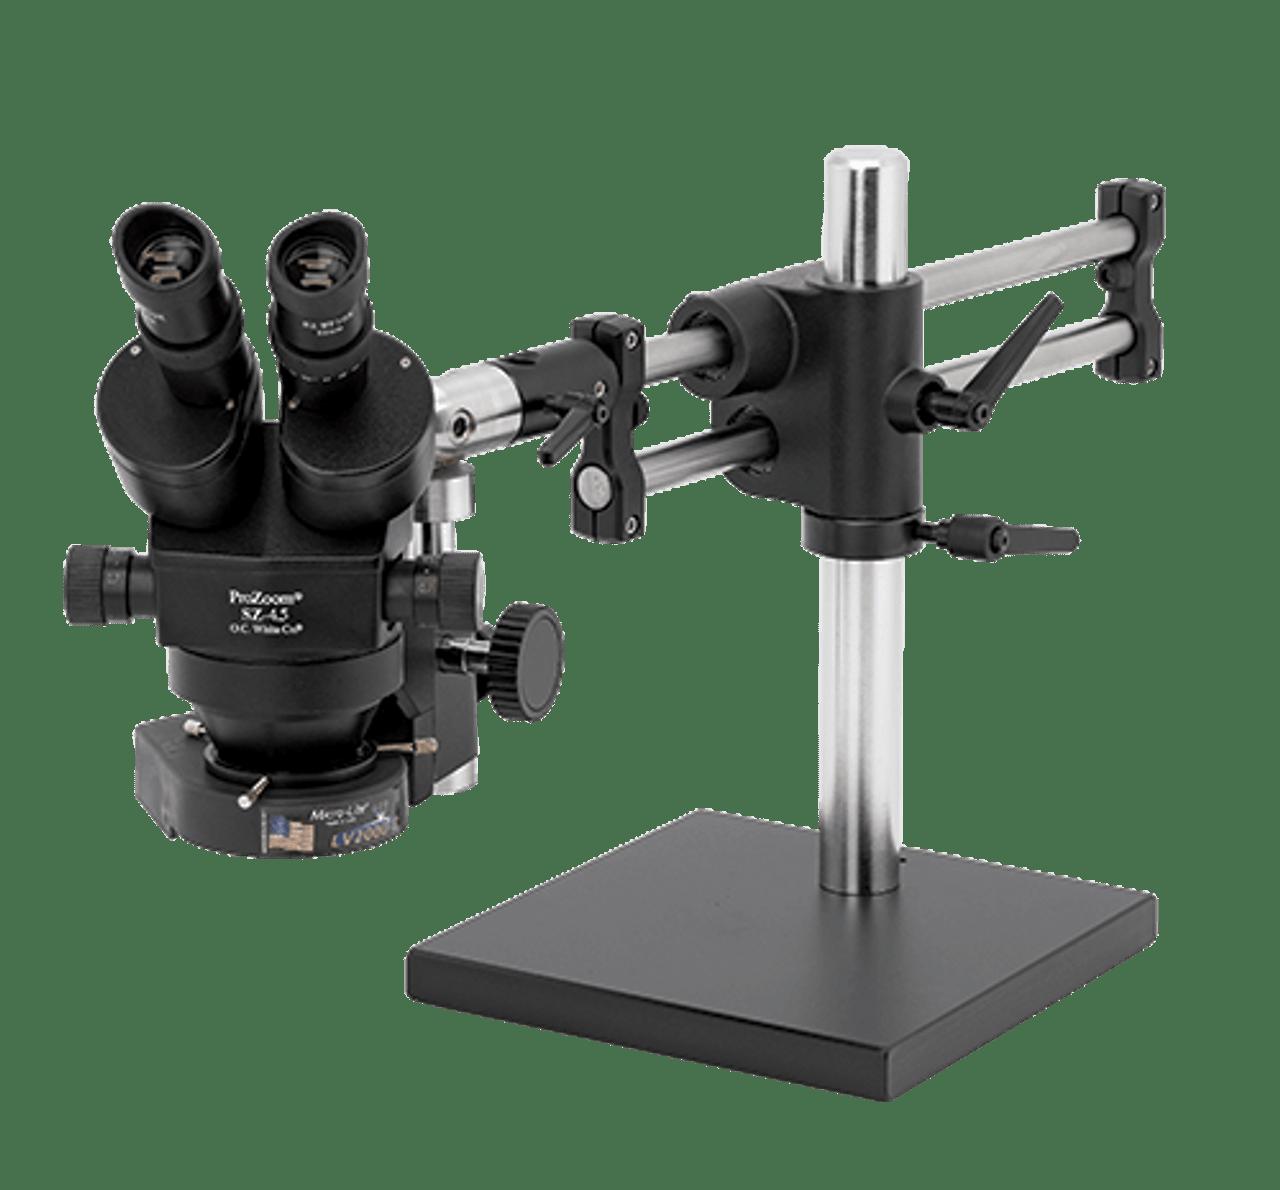 Prozoom 4 5 Binocular Stereo Microscope Sms Labs